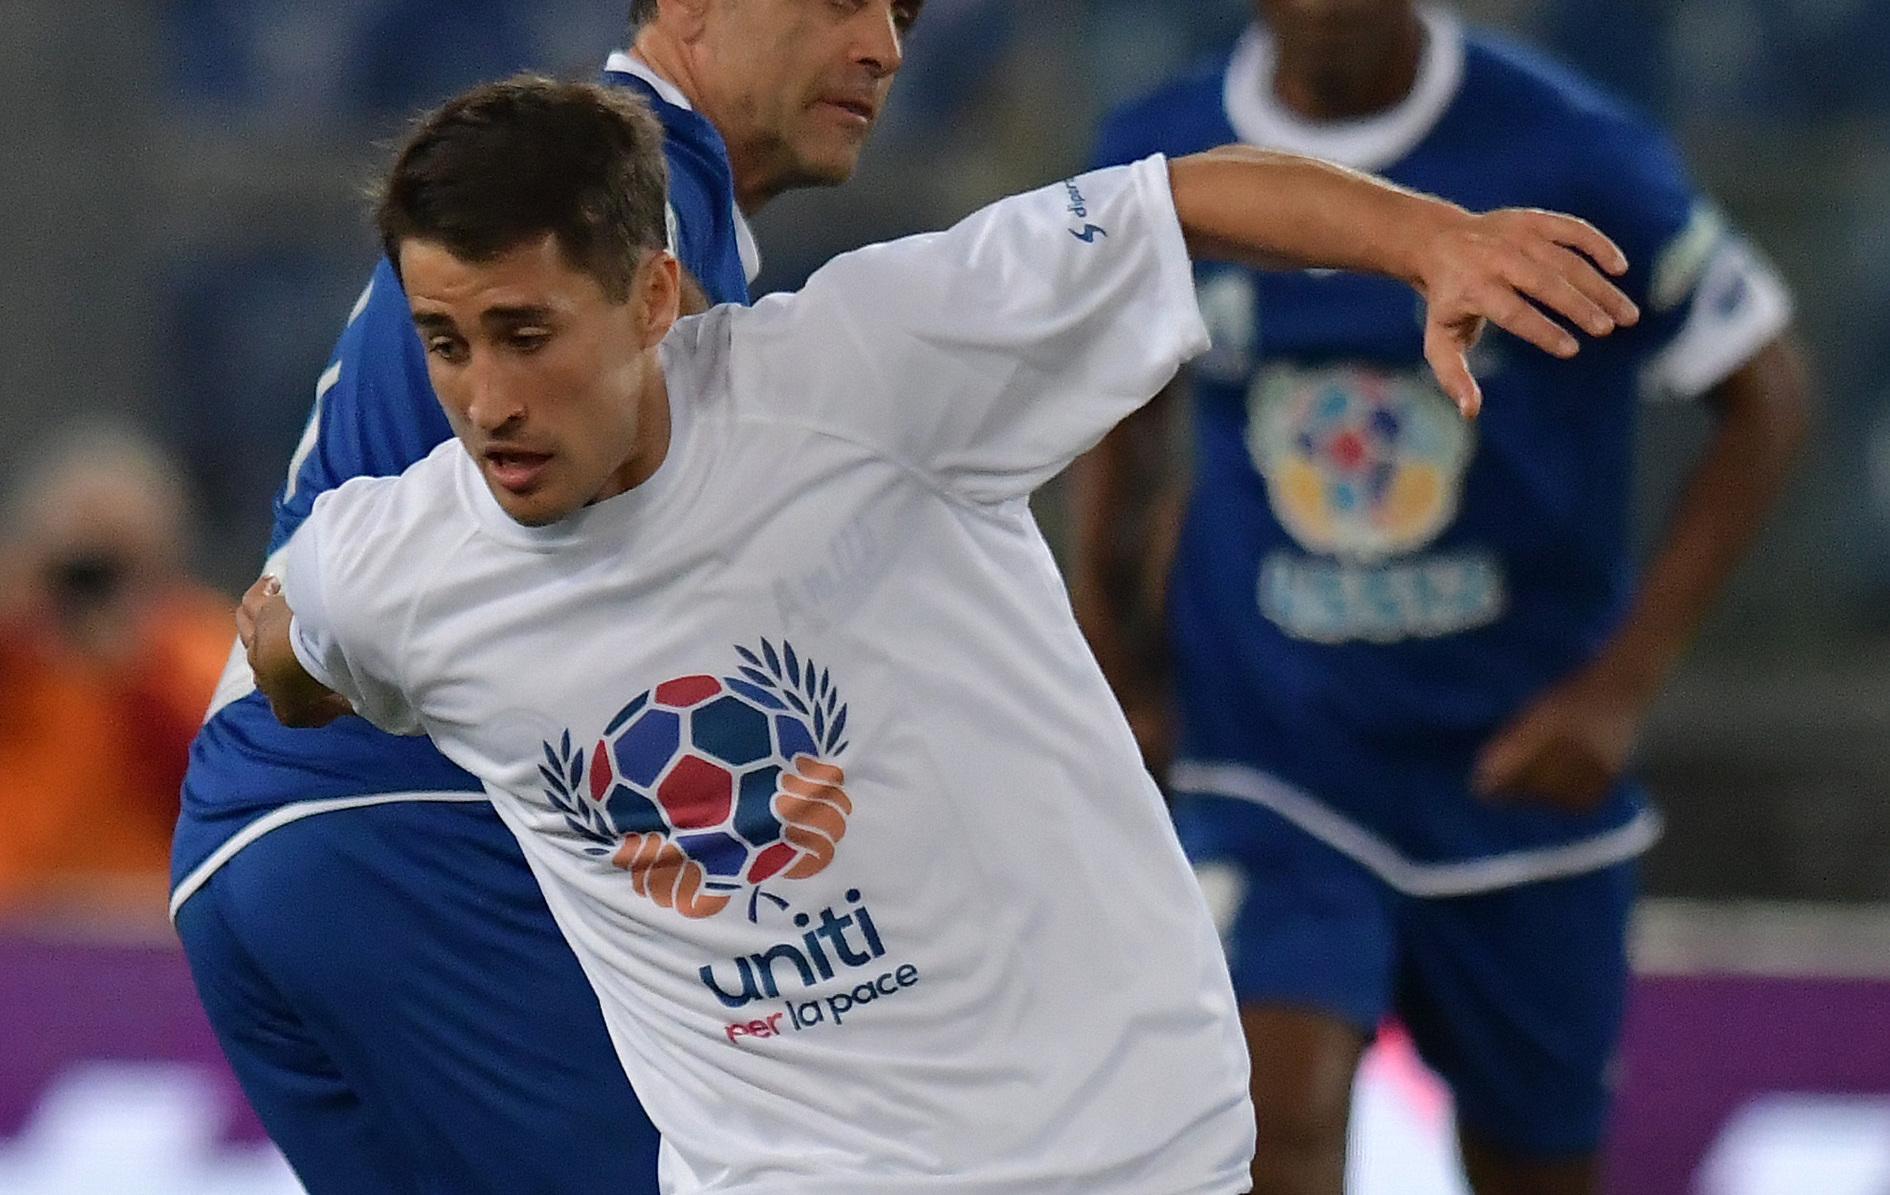 Football - Transferts - Le joli lob de Bojan Krkic